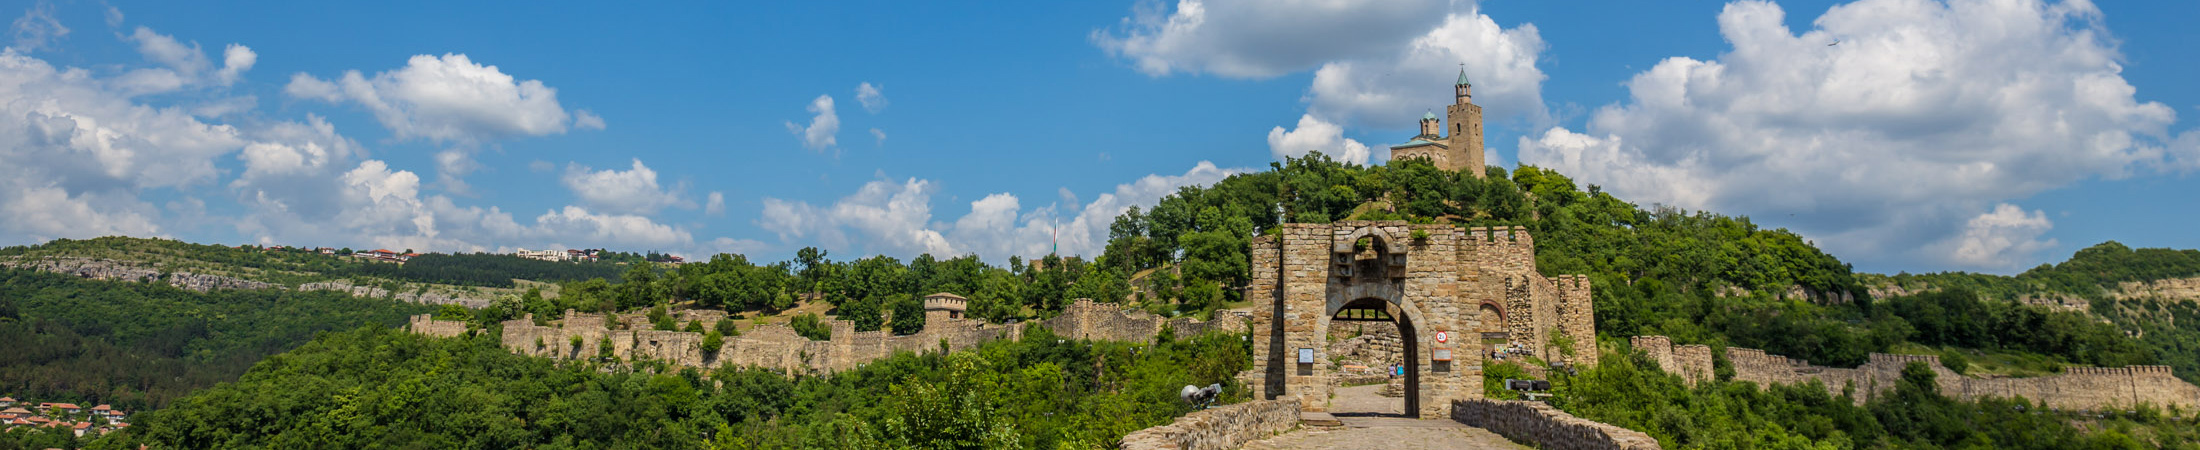 Velik Tarnovo, Tsarevets Fortress, Bulgaria